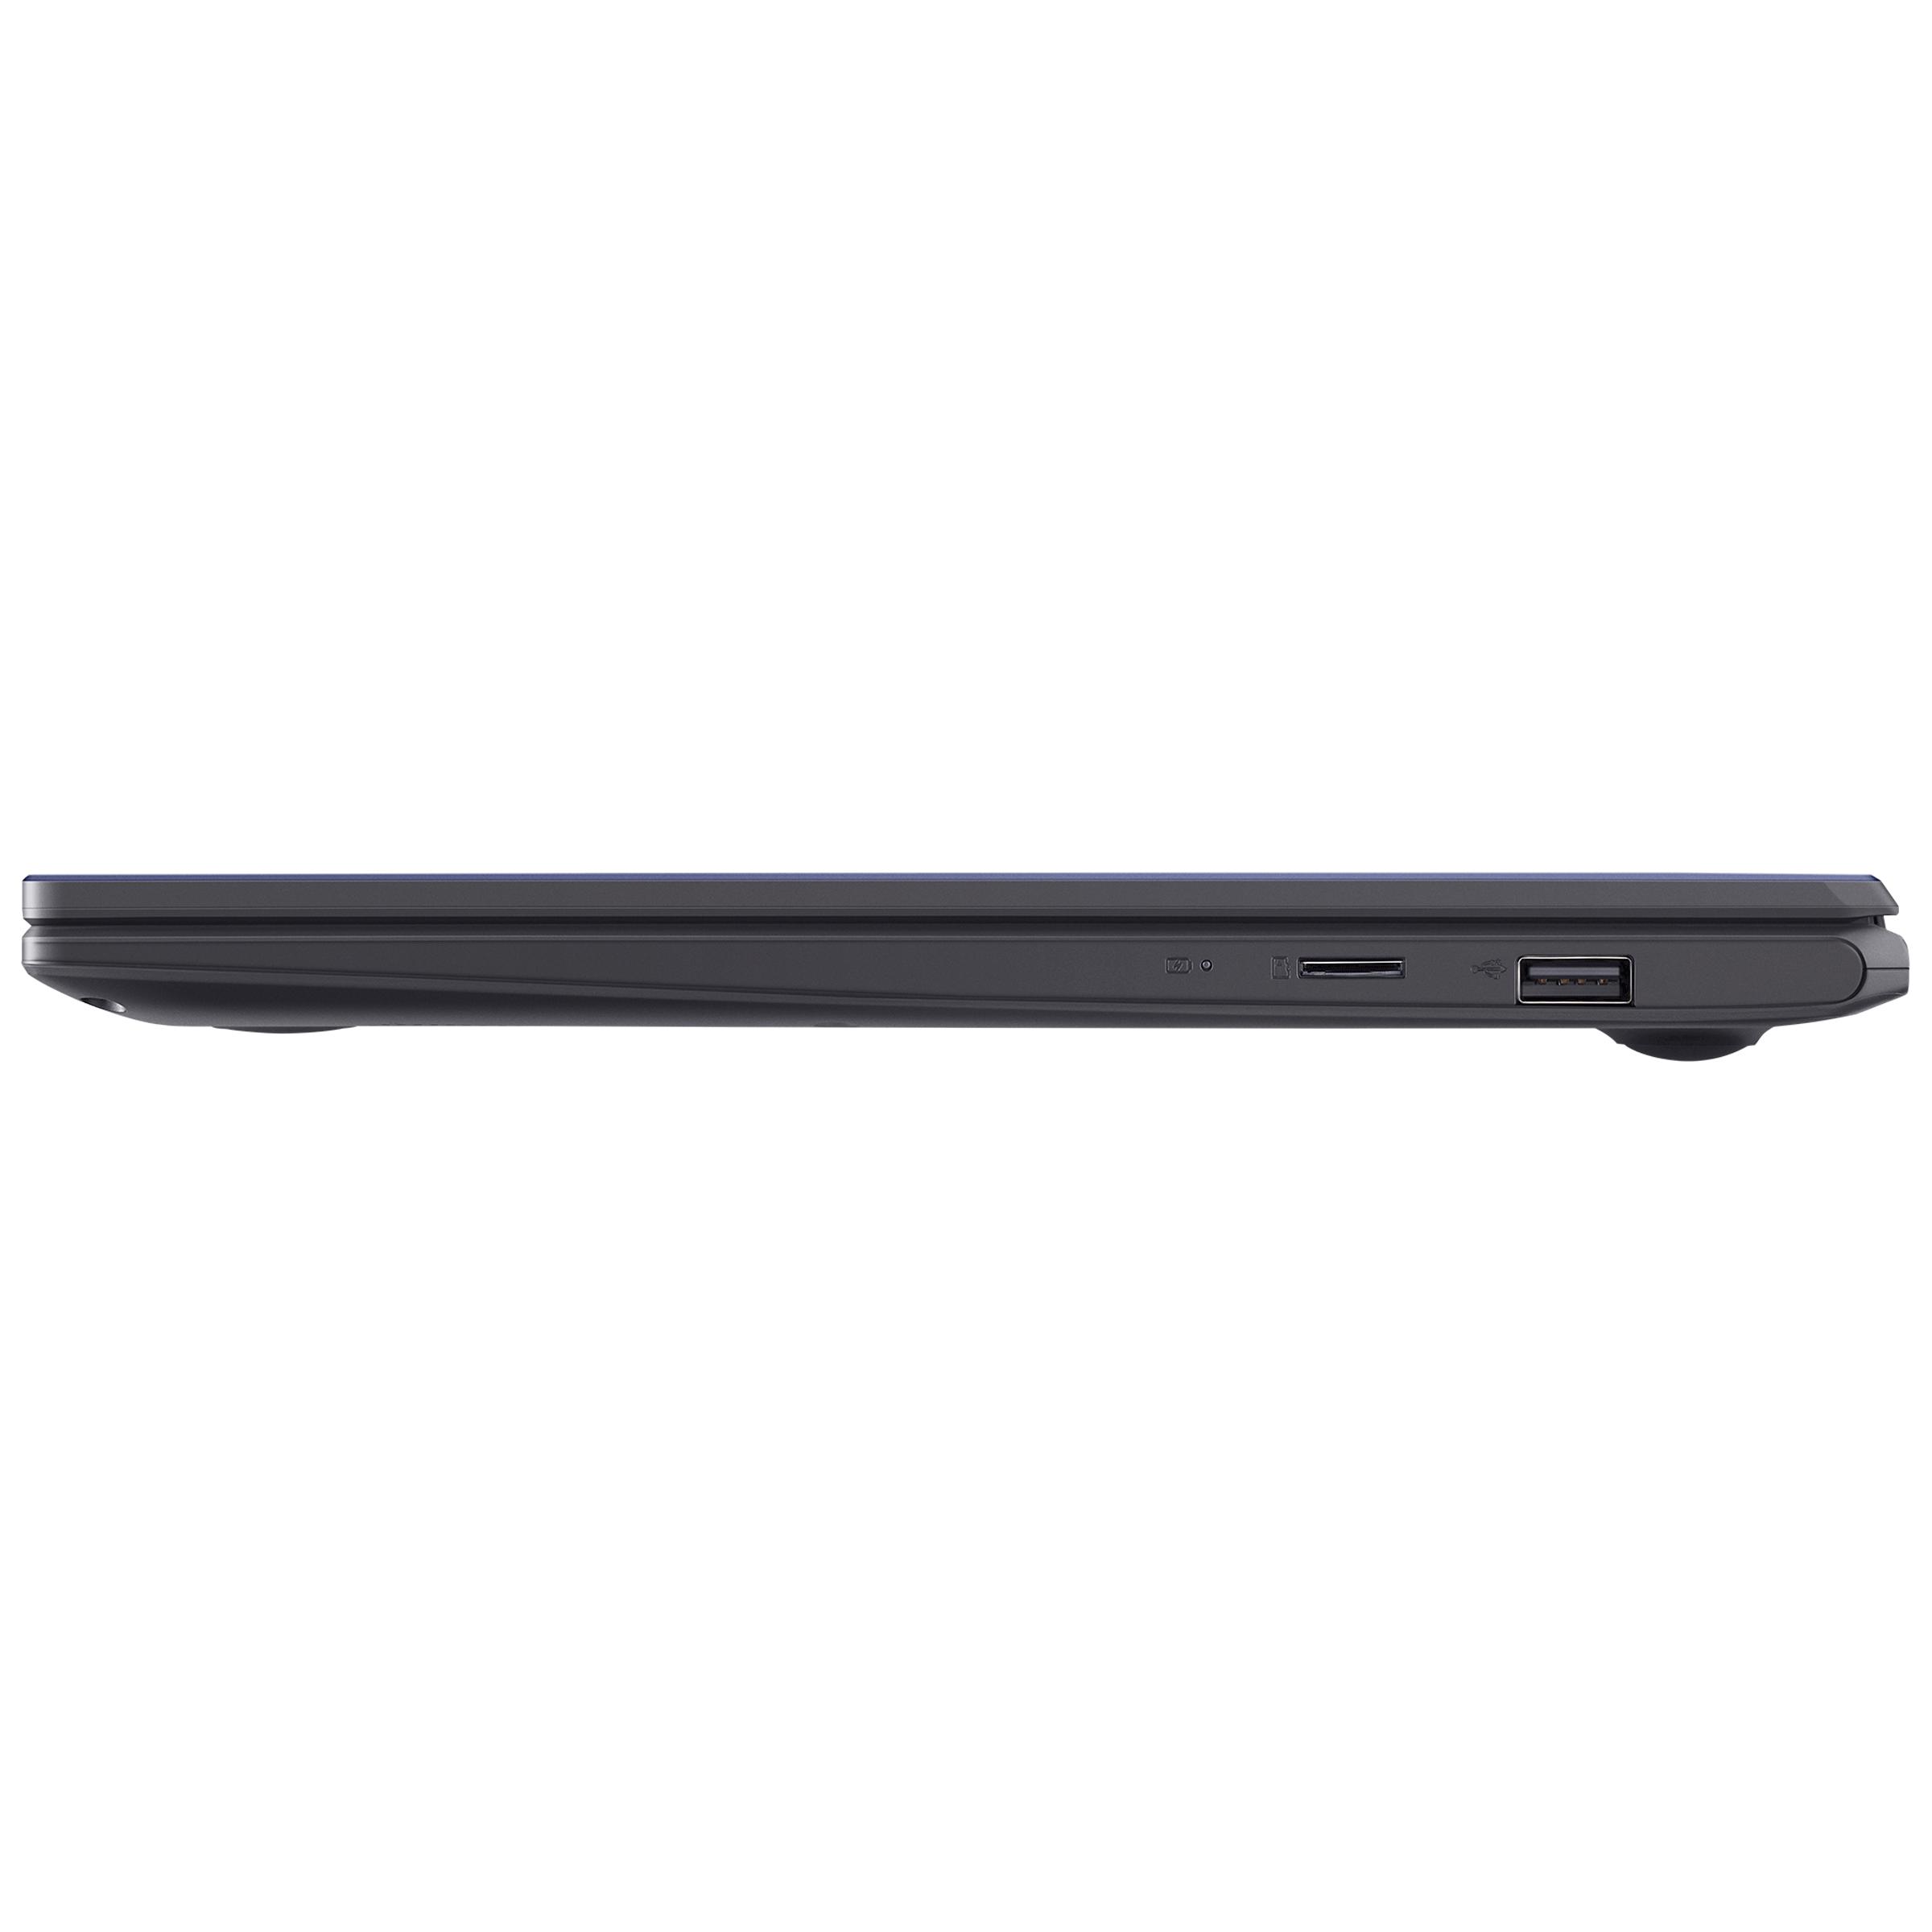 Asus E410MA-EB001T (90NB0Q11-M22940) Celeron Windows 10 Home Laptop (4GB RAM, 256GB SSD, Intel UHD Graphics 600, 35.56cm, Peacock Blue) 8